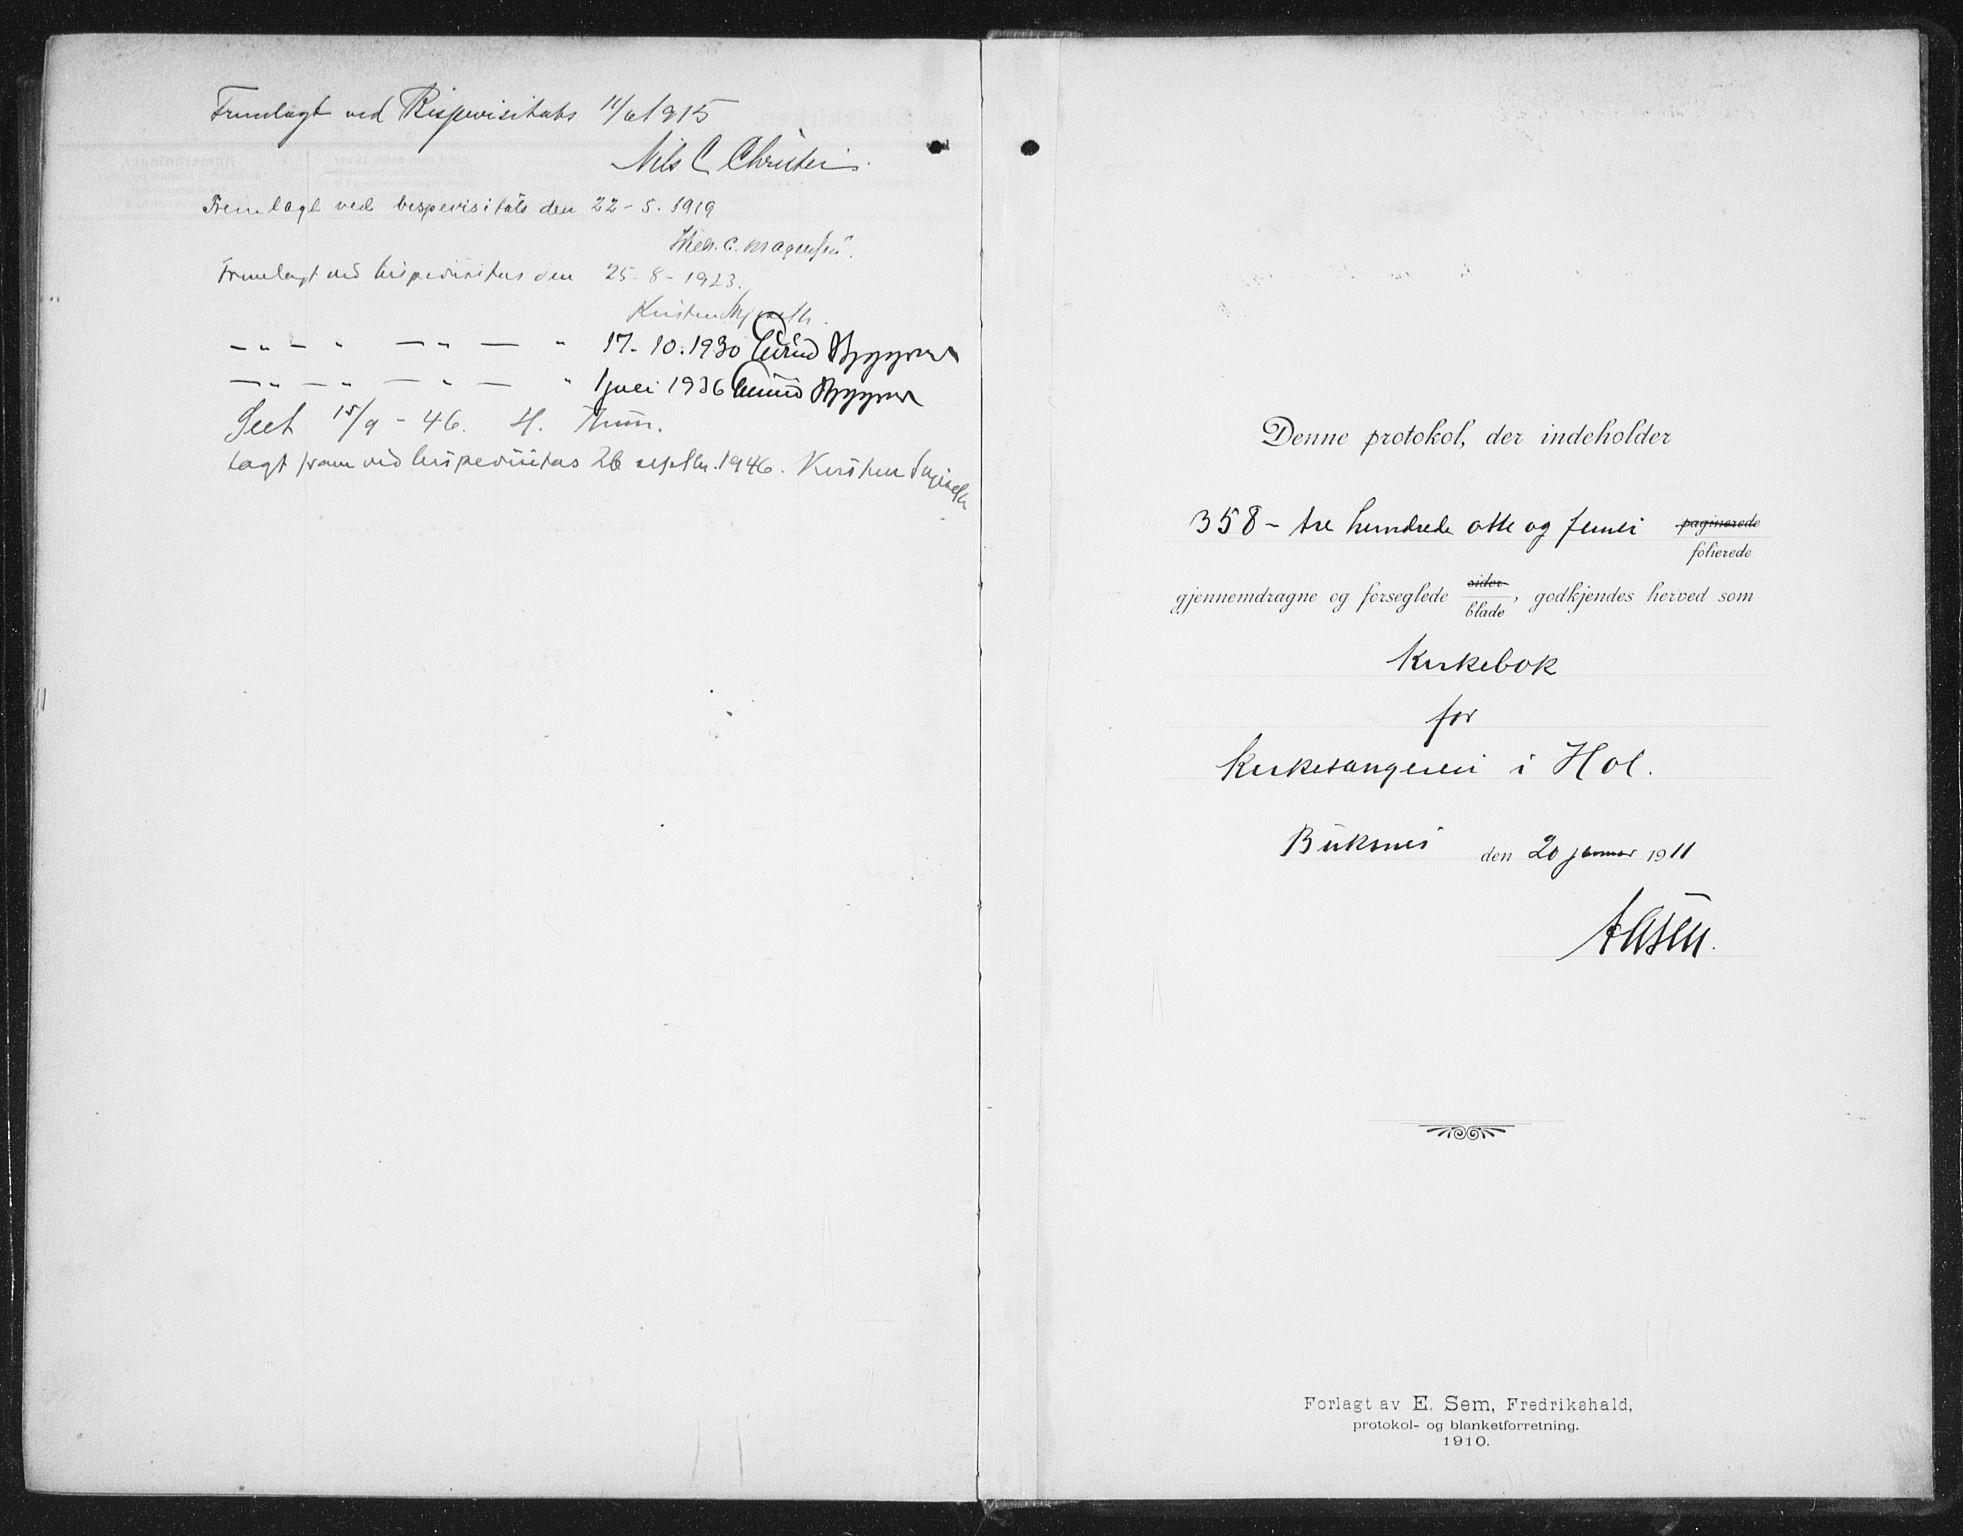 SAT, Ministerialprotokoller, klokkerbøker og fødselsregistre - Nordland, 882/L1183: Klokkerbok nr. 882C01, 1911-1938